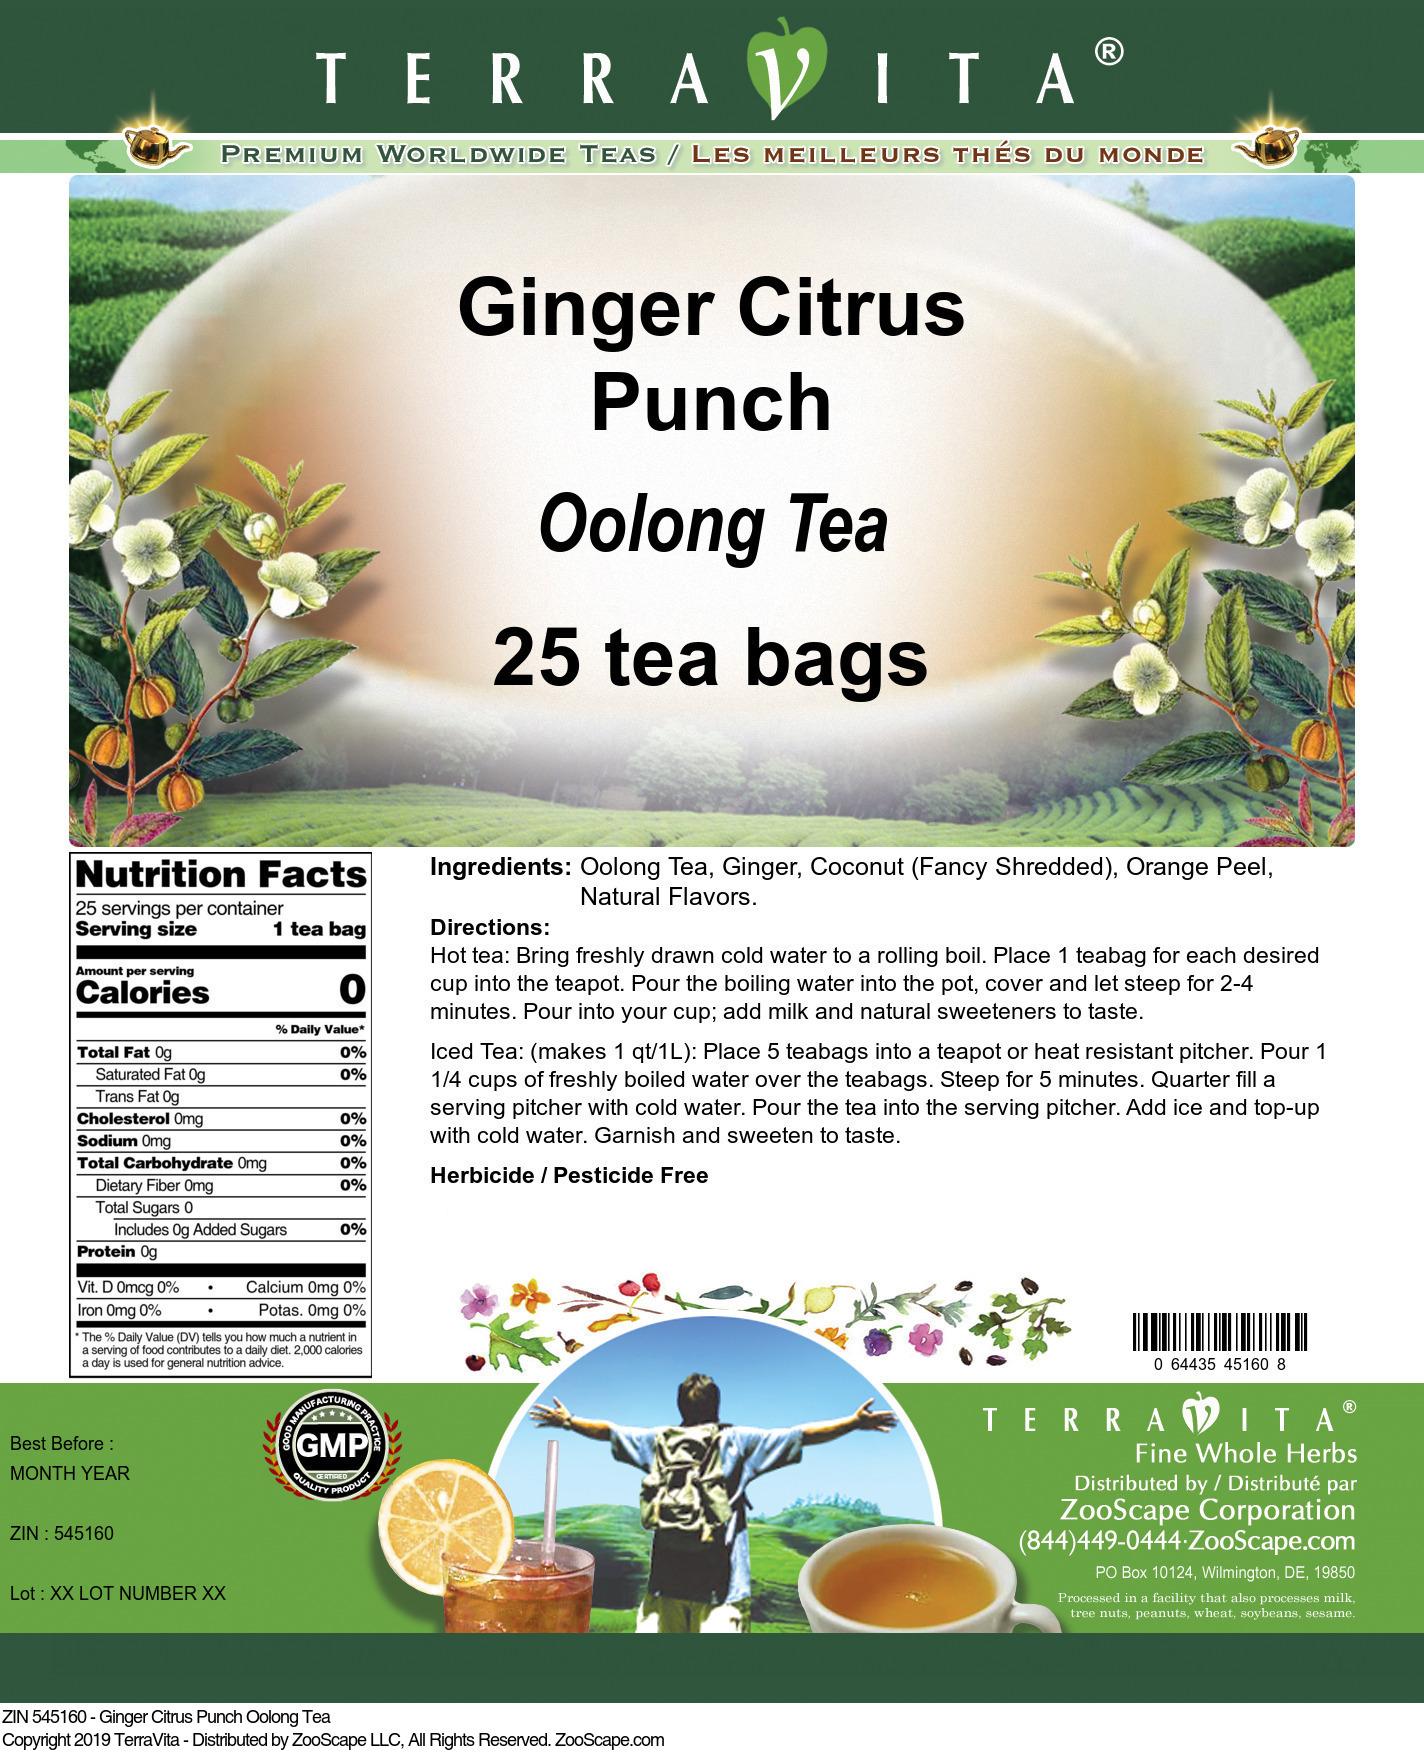 Ginger Citrus Punch Oolong Tea